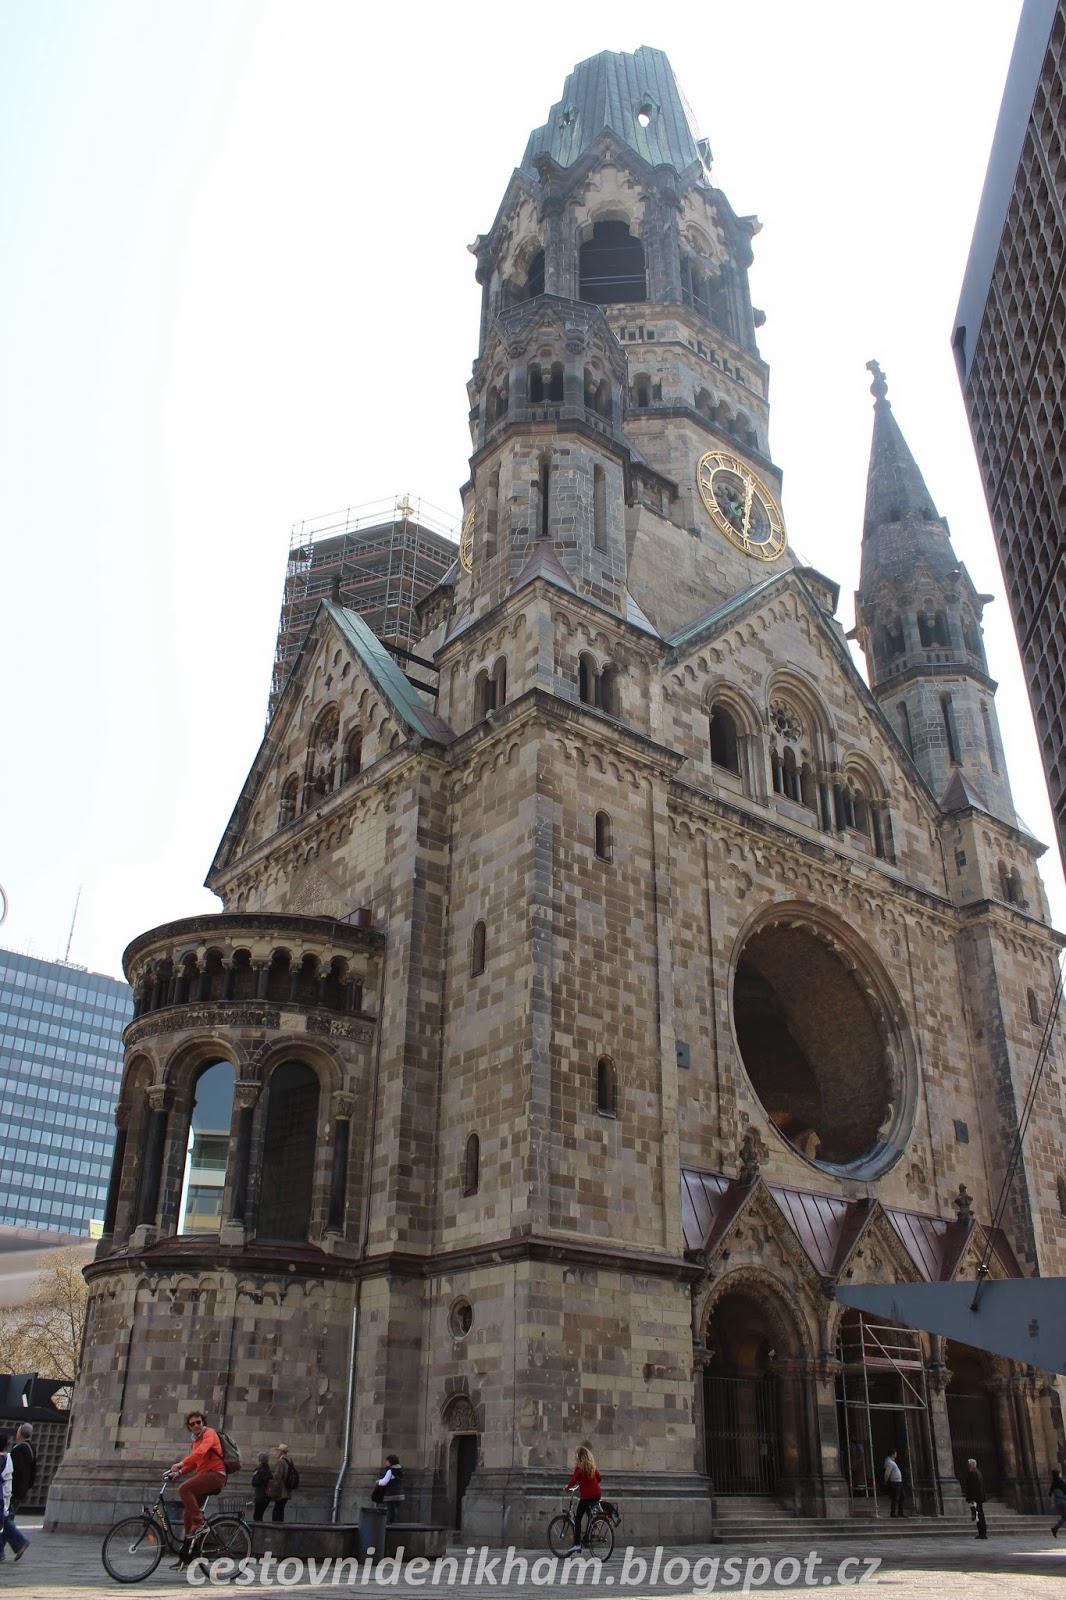 pamětní kostel Viléma I. // kaiser Wilhelm memorial church